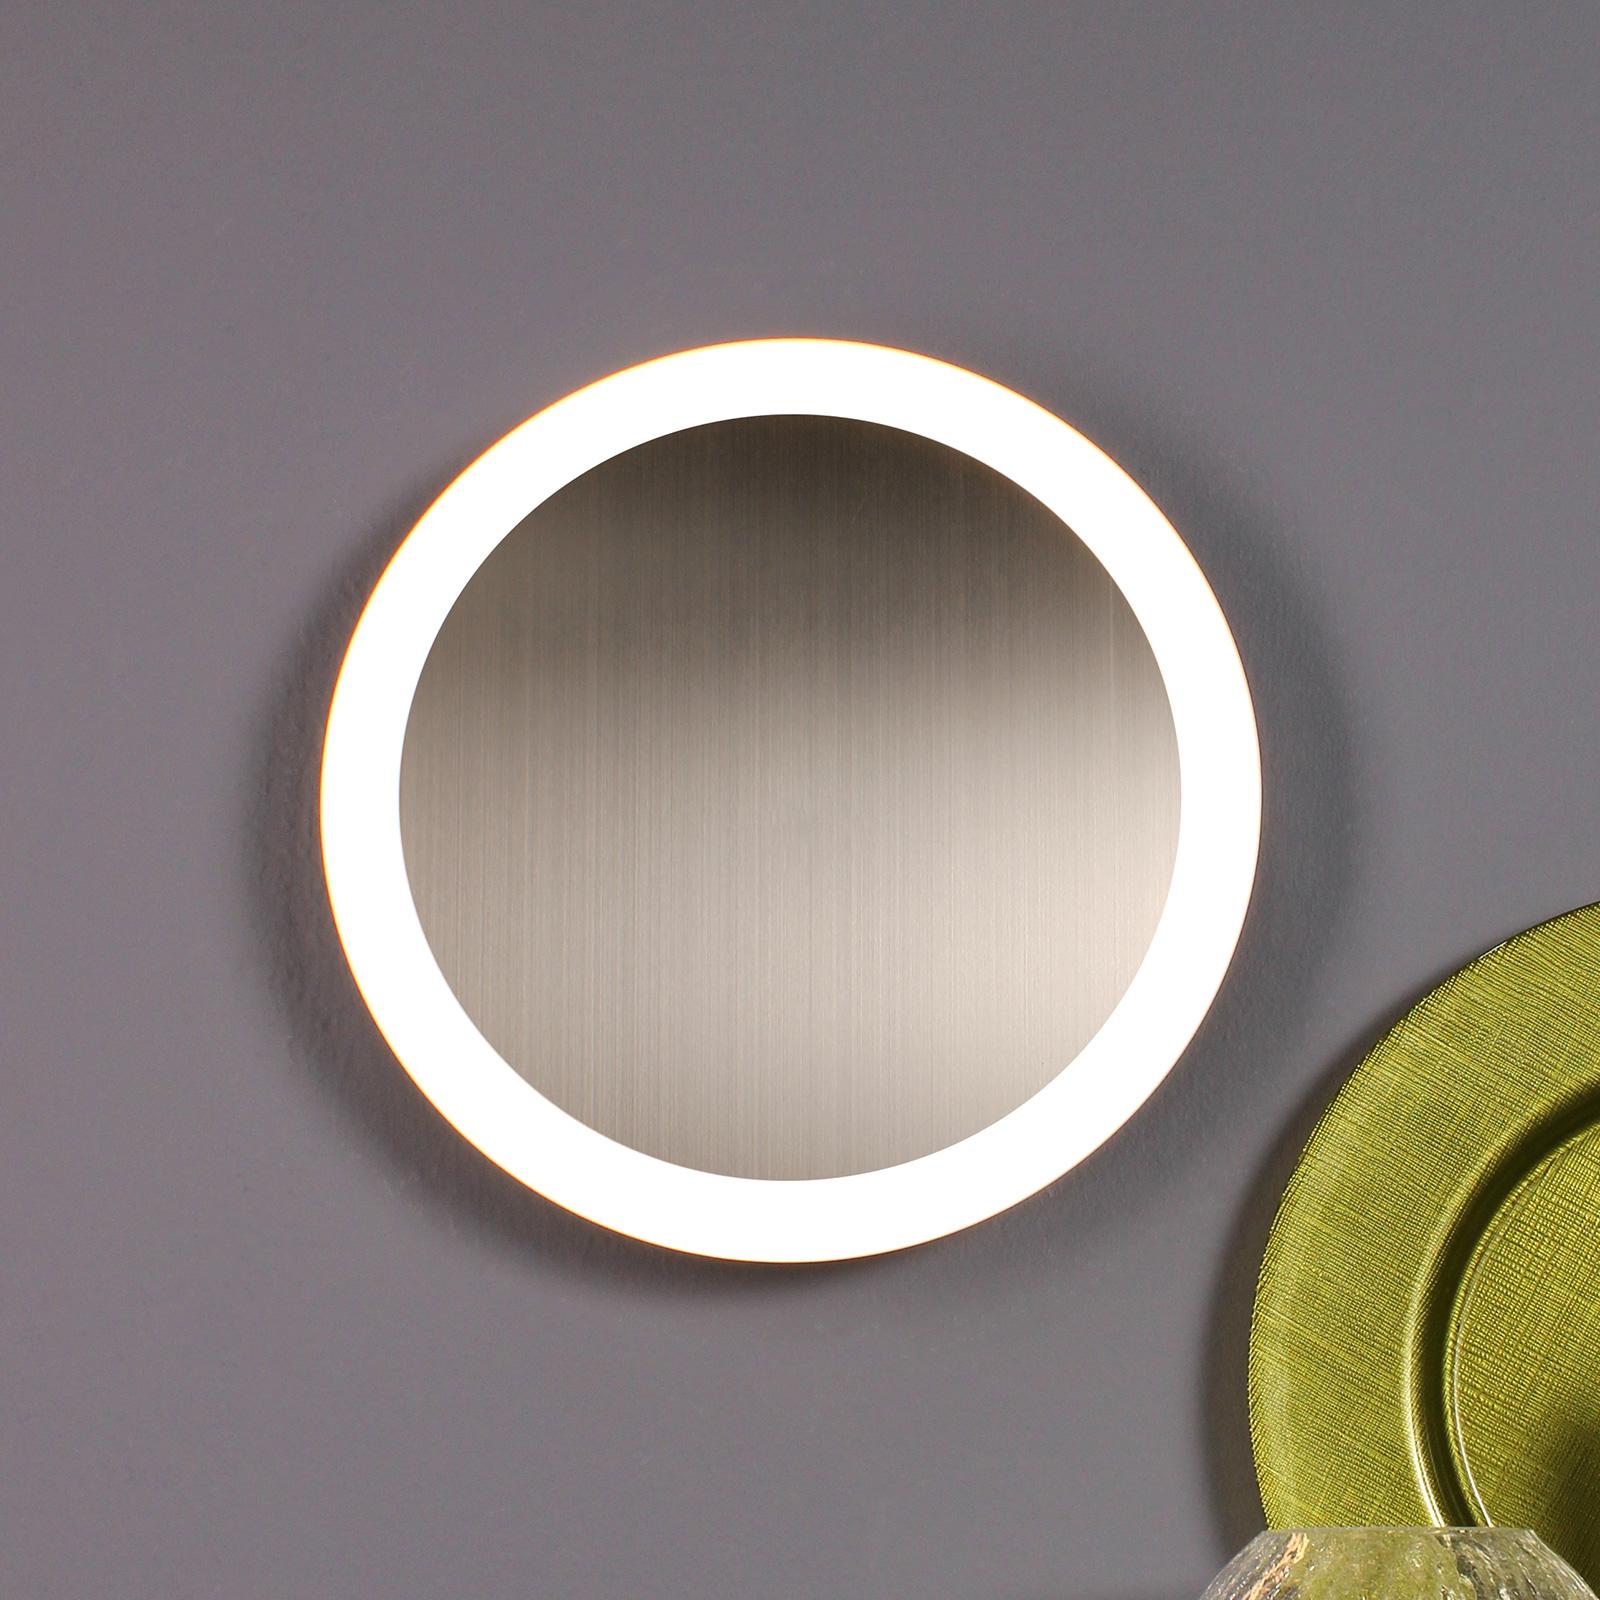 Lampa sufitowa LED Moon Ø 30 cm, srebrna